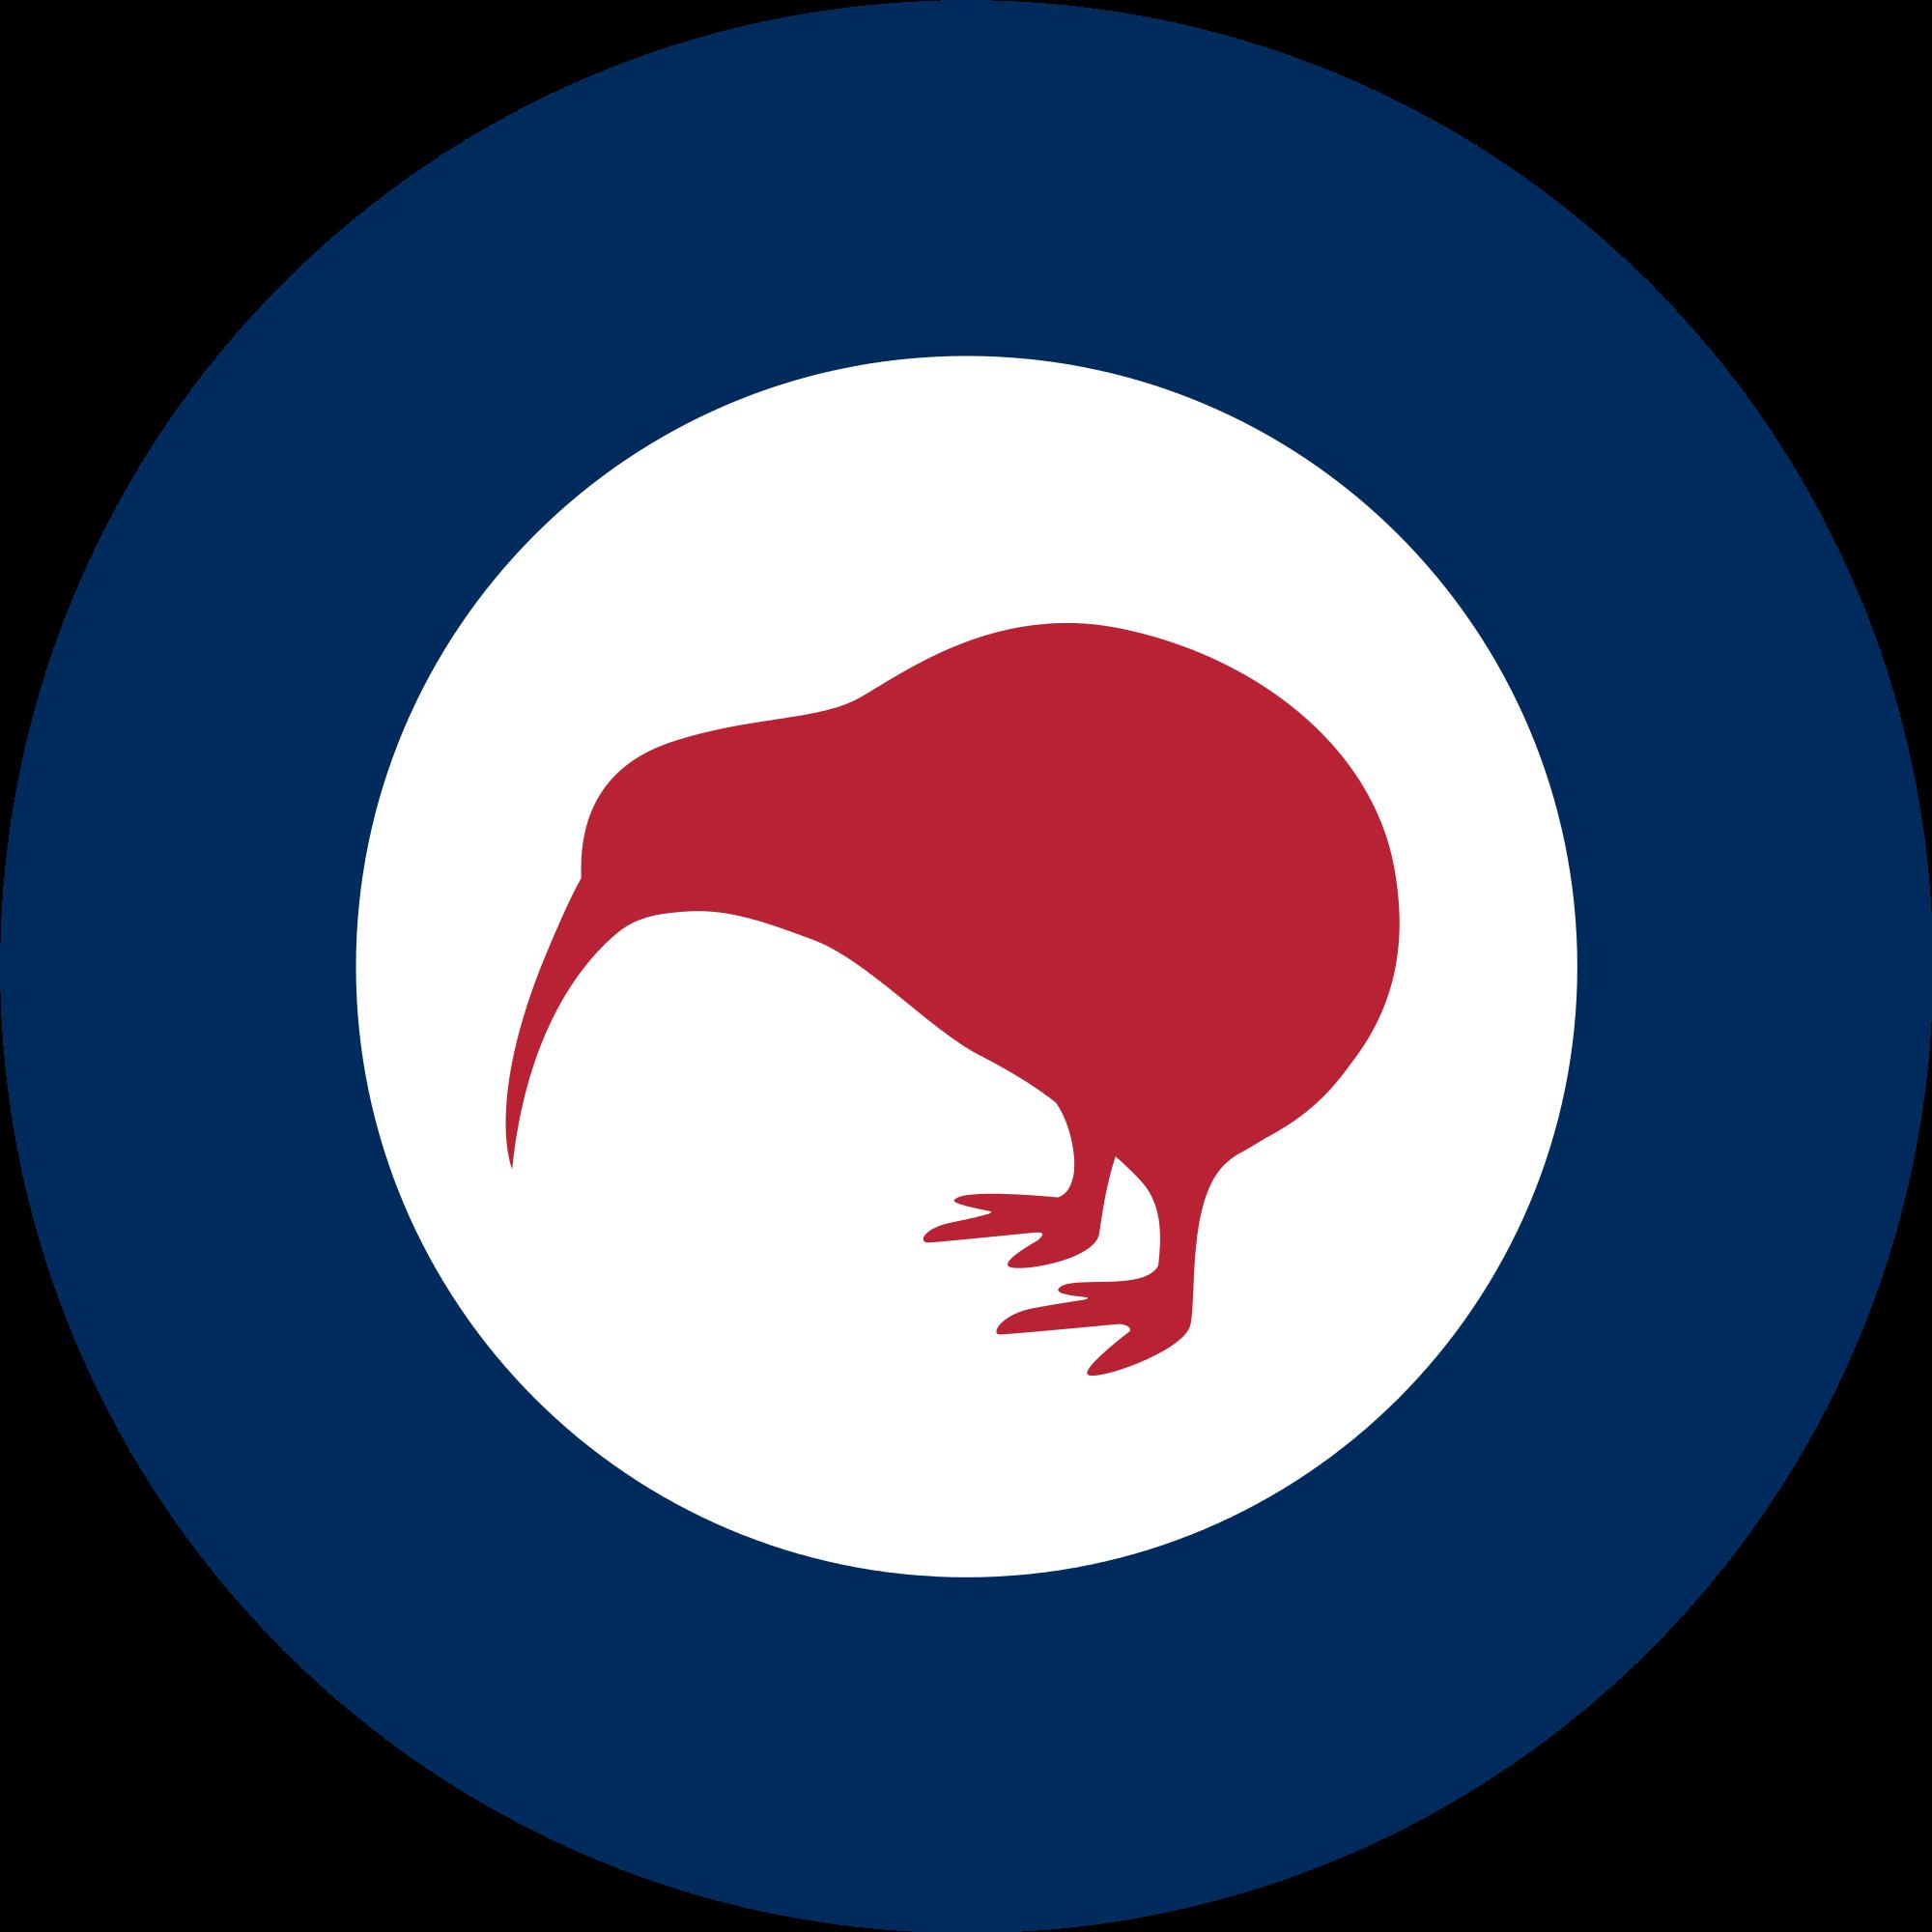 Red bird image in. Kiwi clipart circle